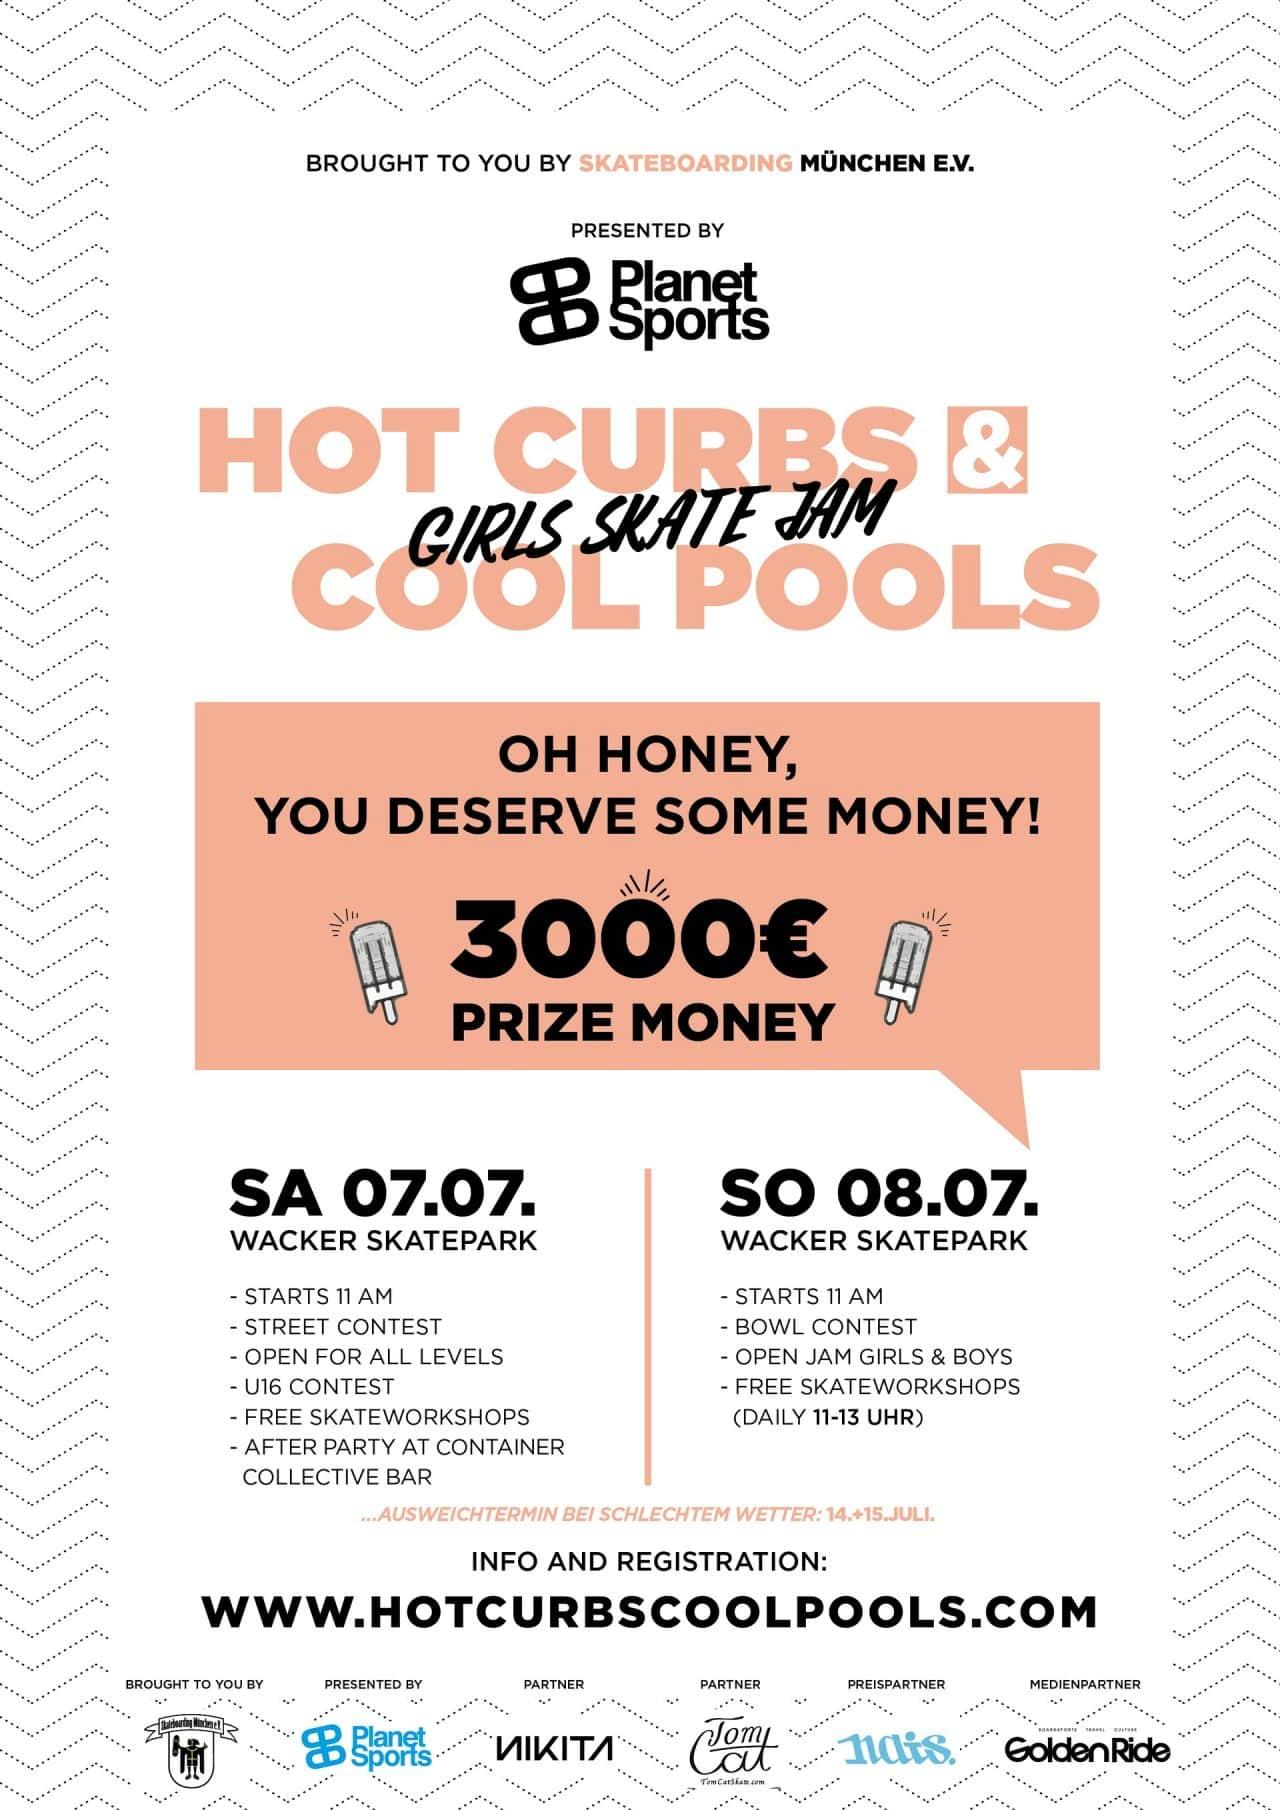 Hot Curbs & Cool Pools, Skateboard Event für Frauen, München